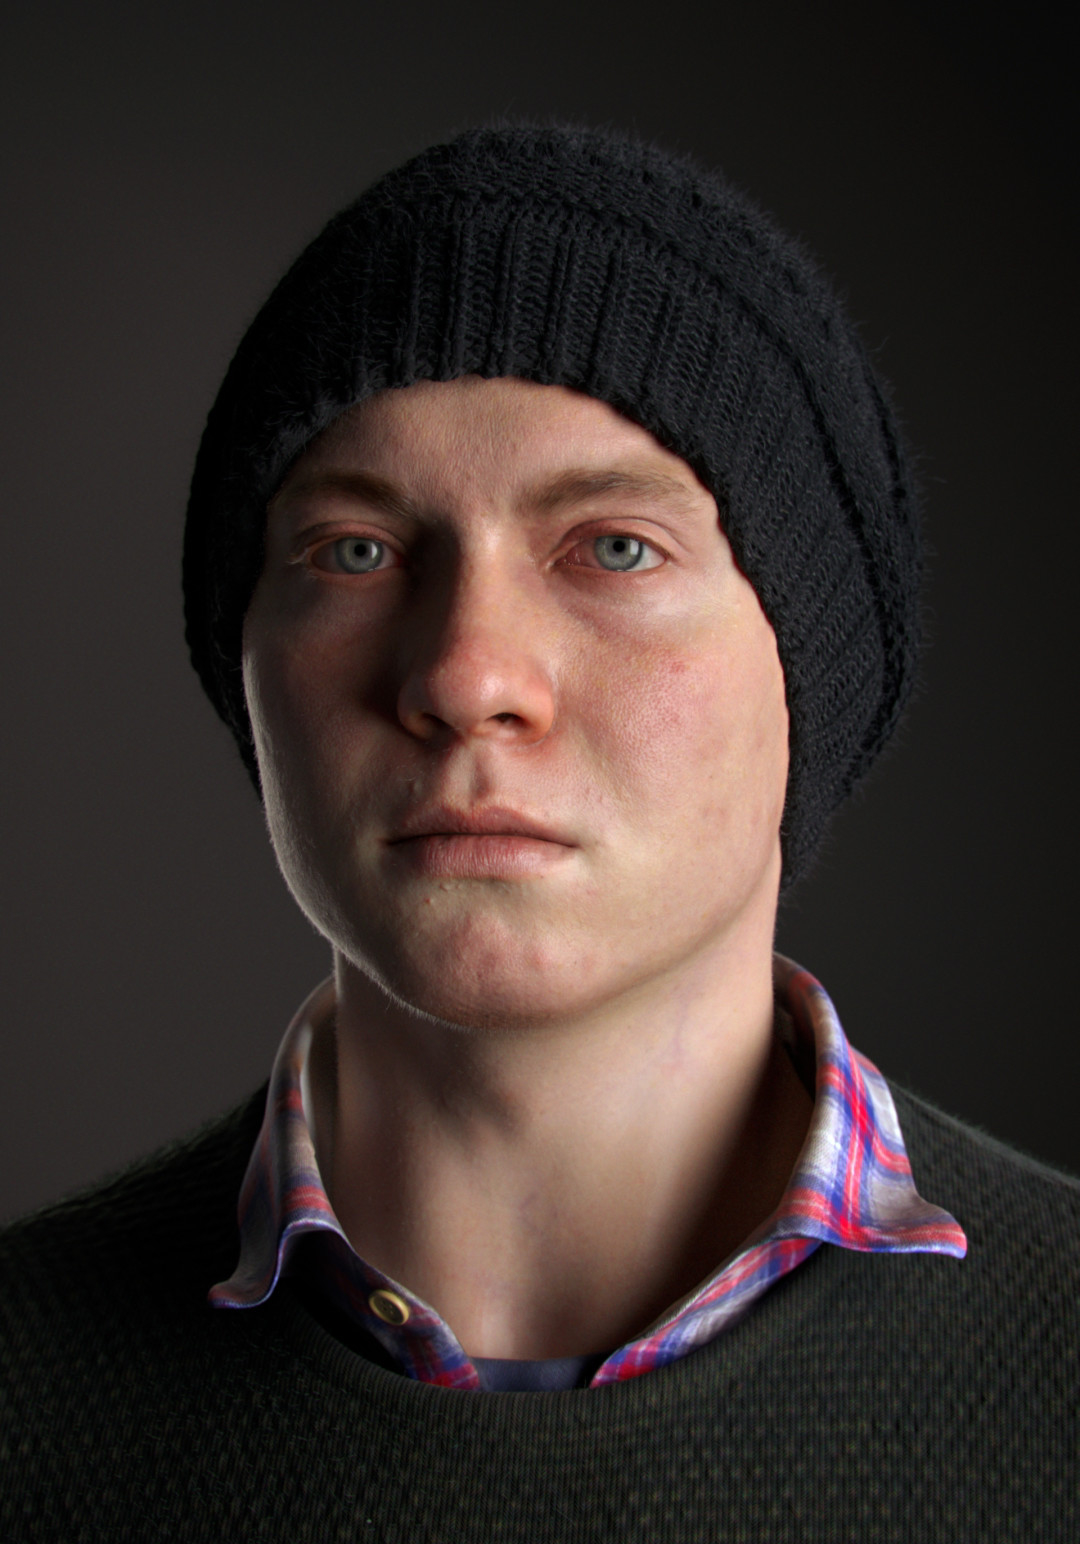 Sefkiibrahim digital portrait 1 55daa912 evqy